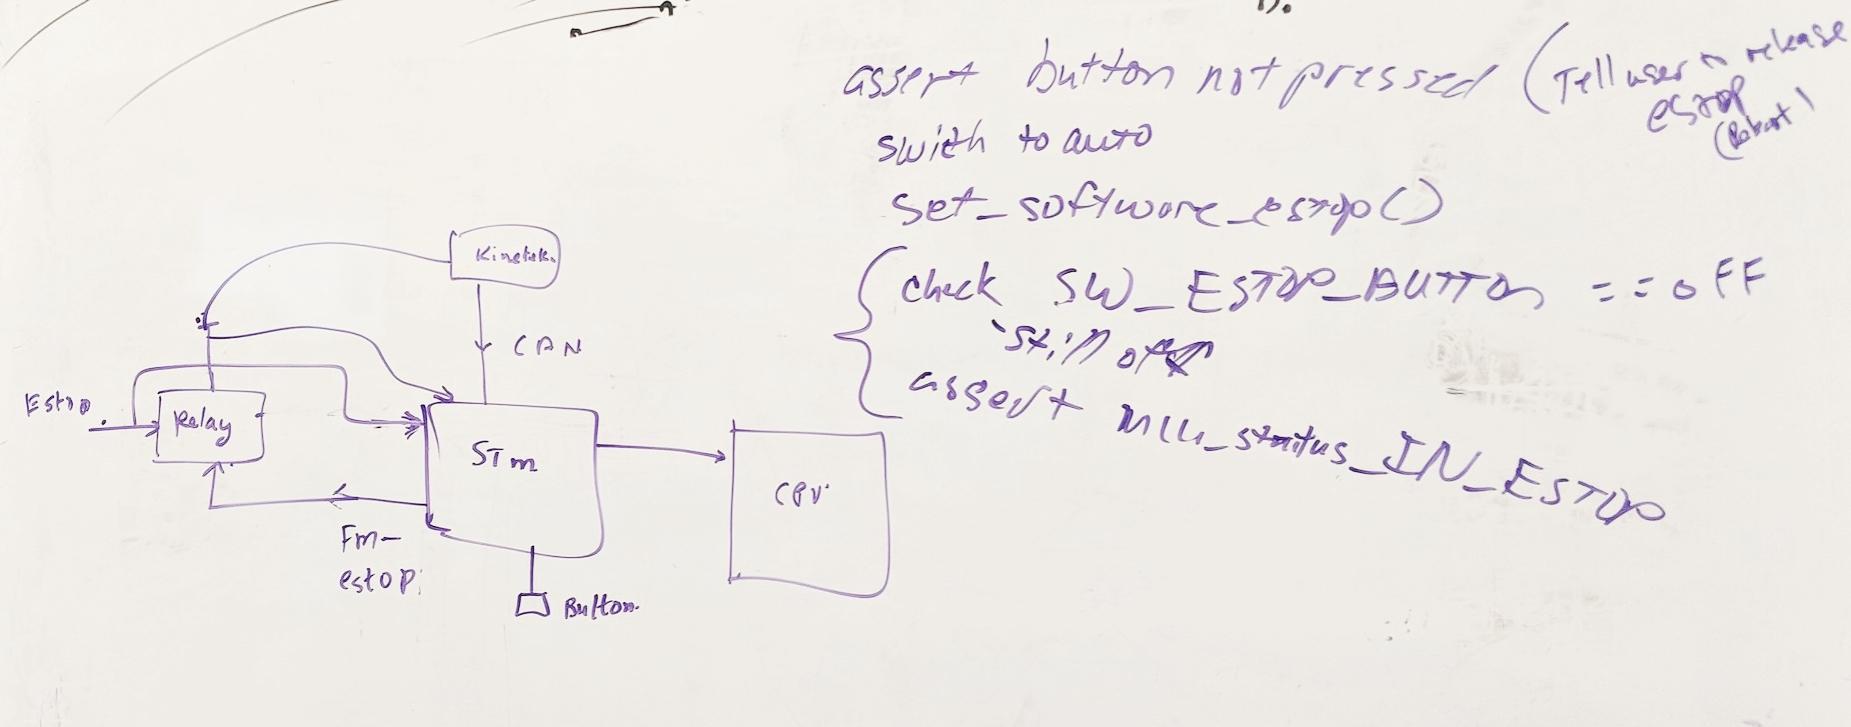 Whiteboard hardware/firmware workflow for soft vs hard estop behaviors.